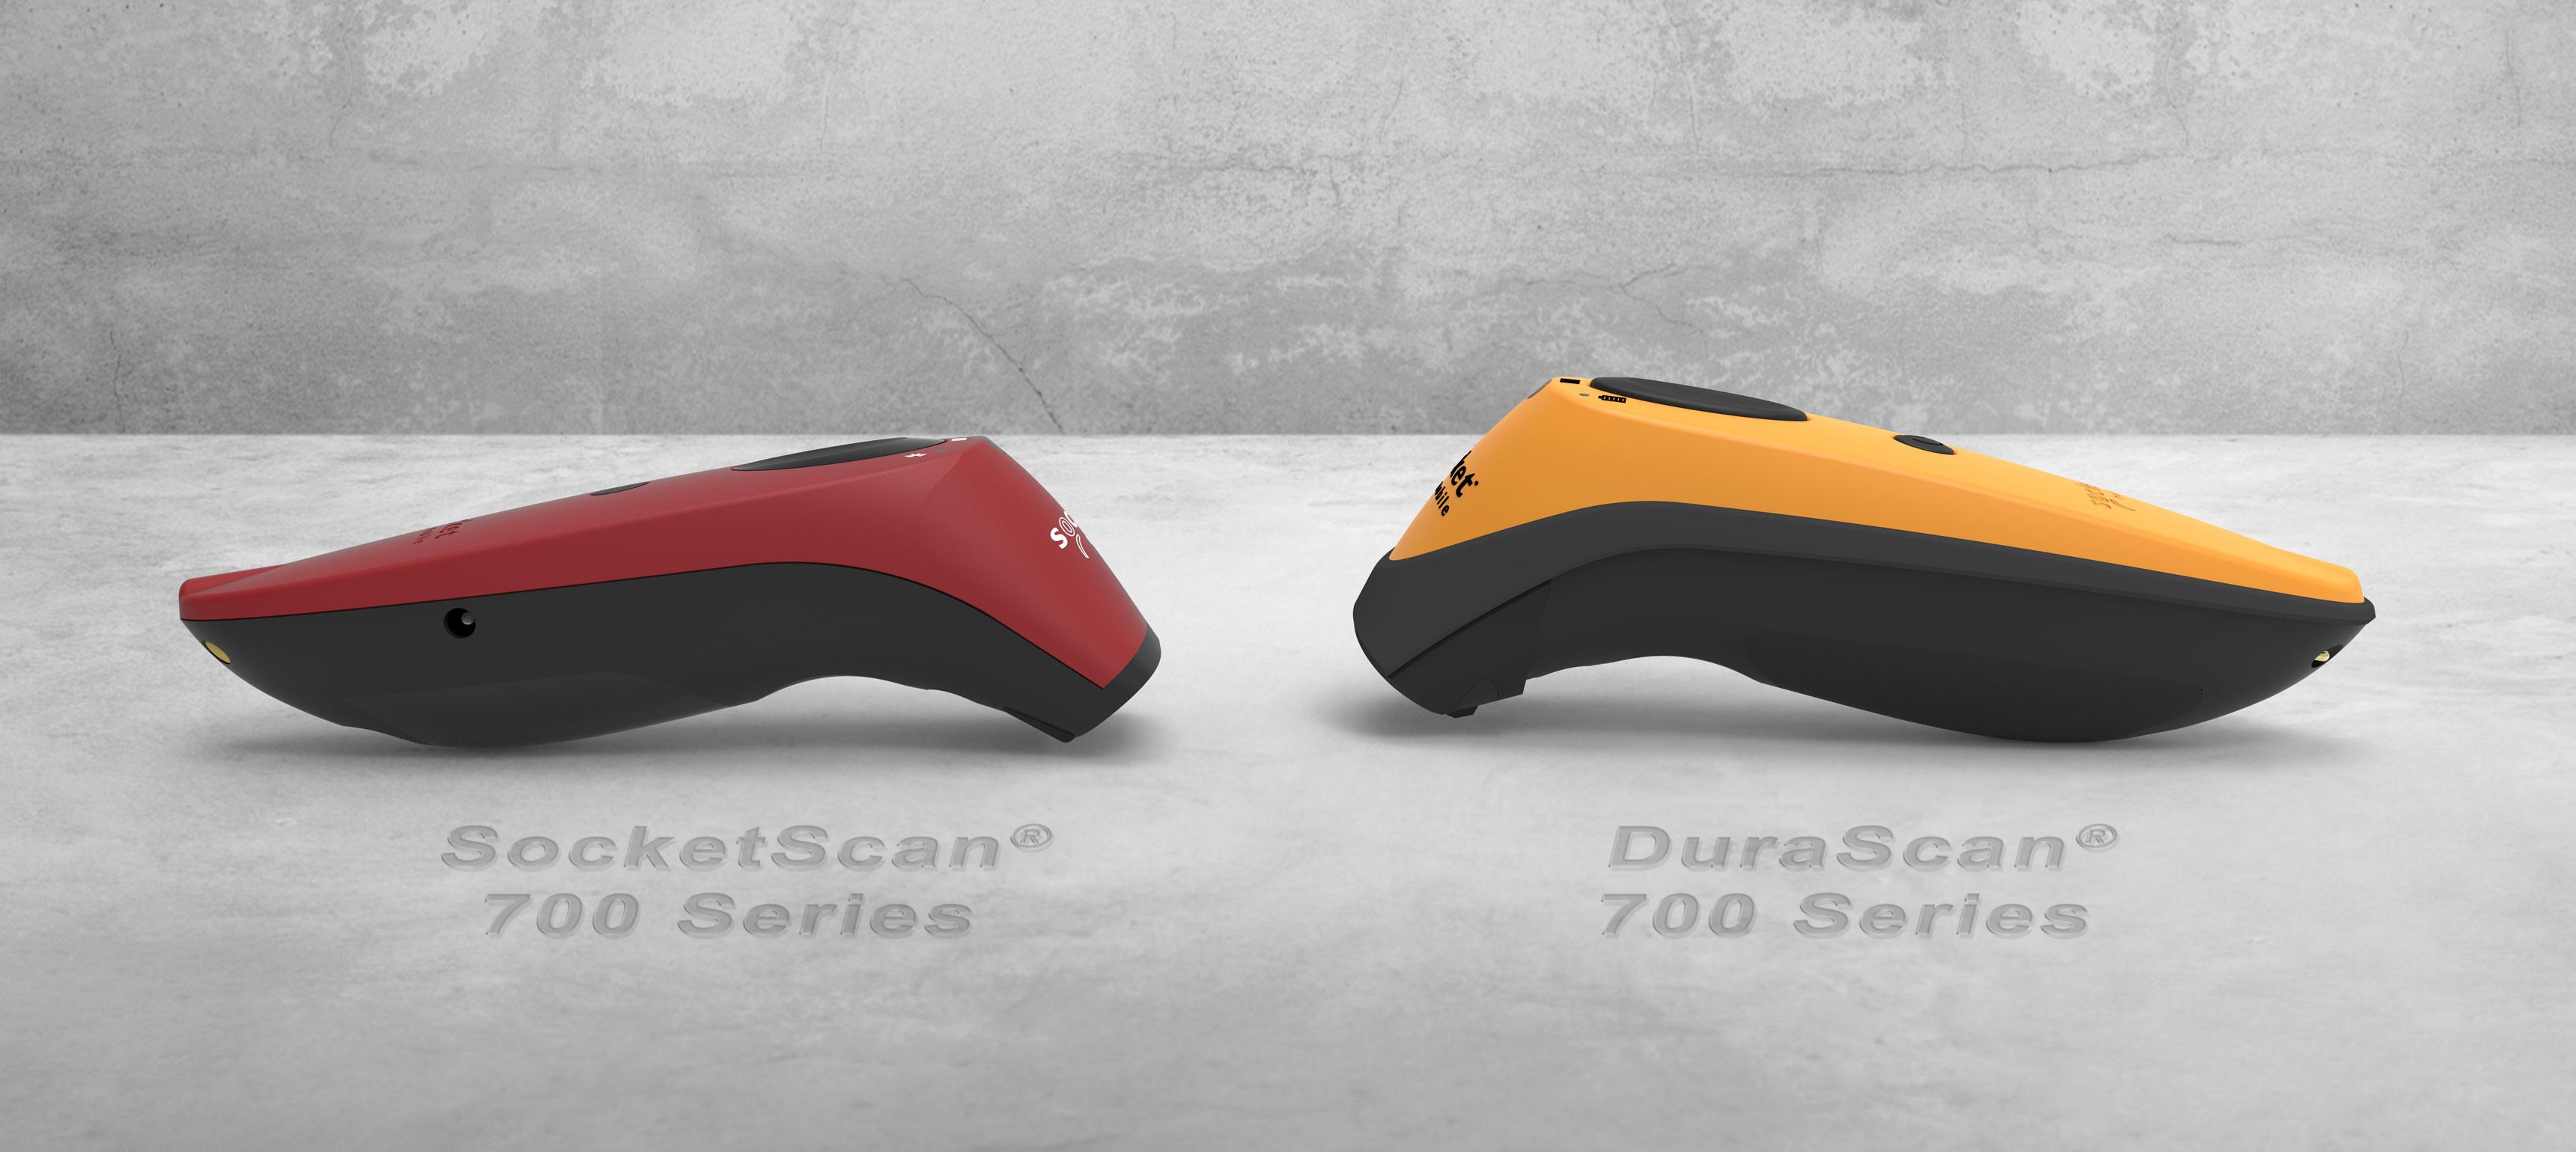 SocketScan 700 Series vs. DuraScan 700 Series